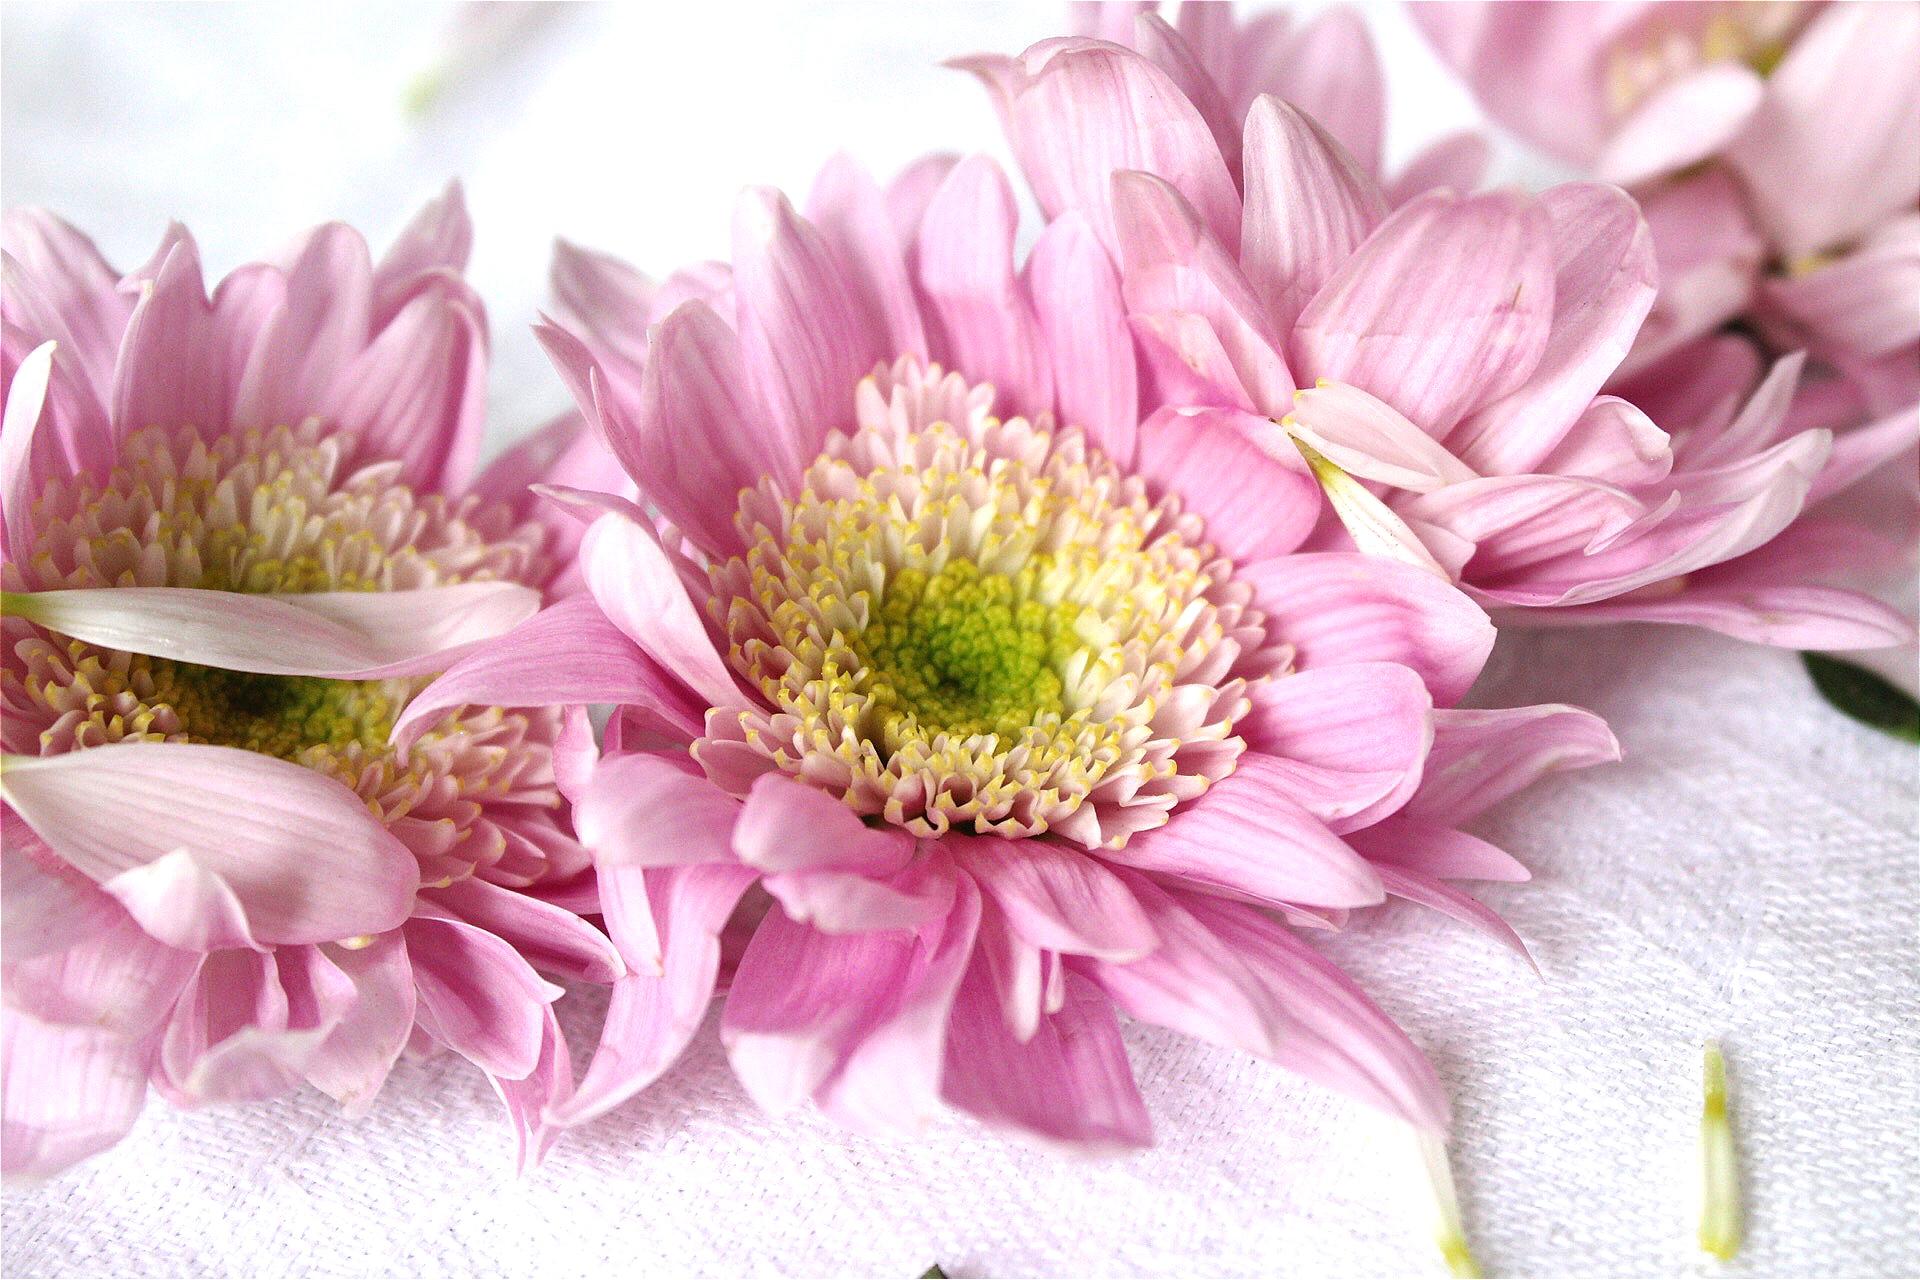 Botanical Prayer - an offering of love